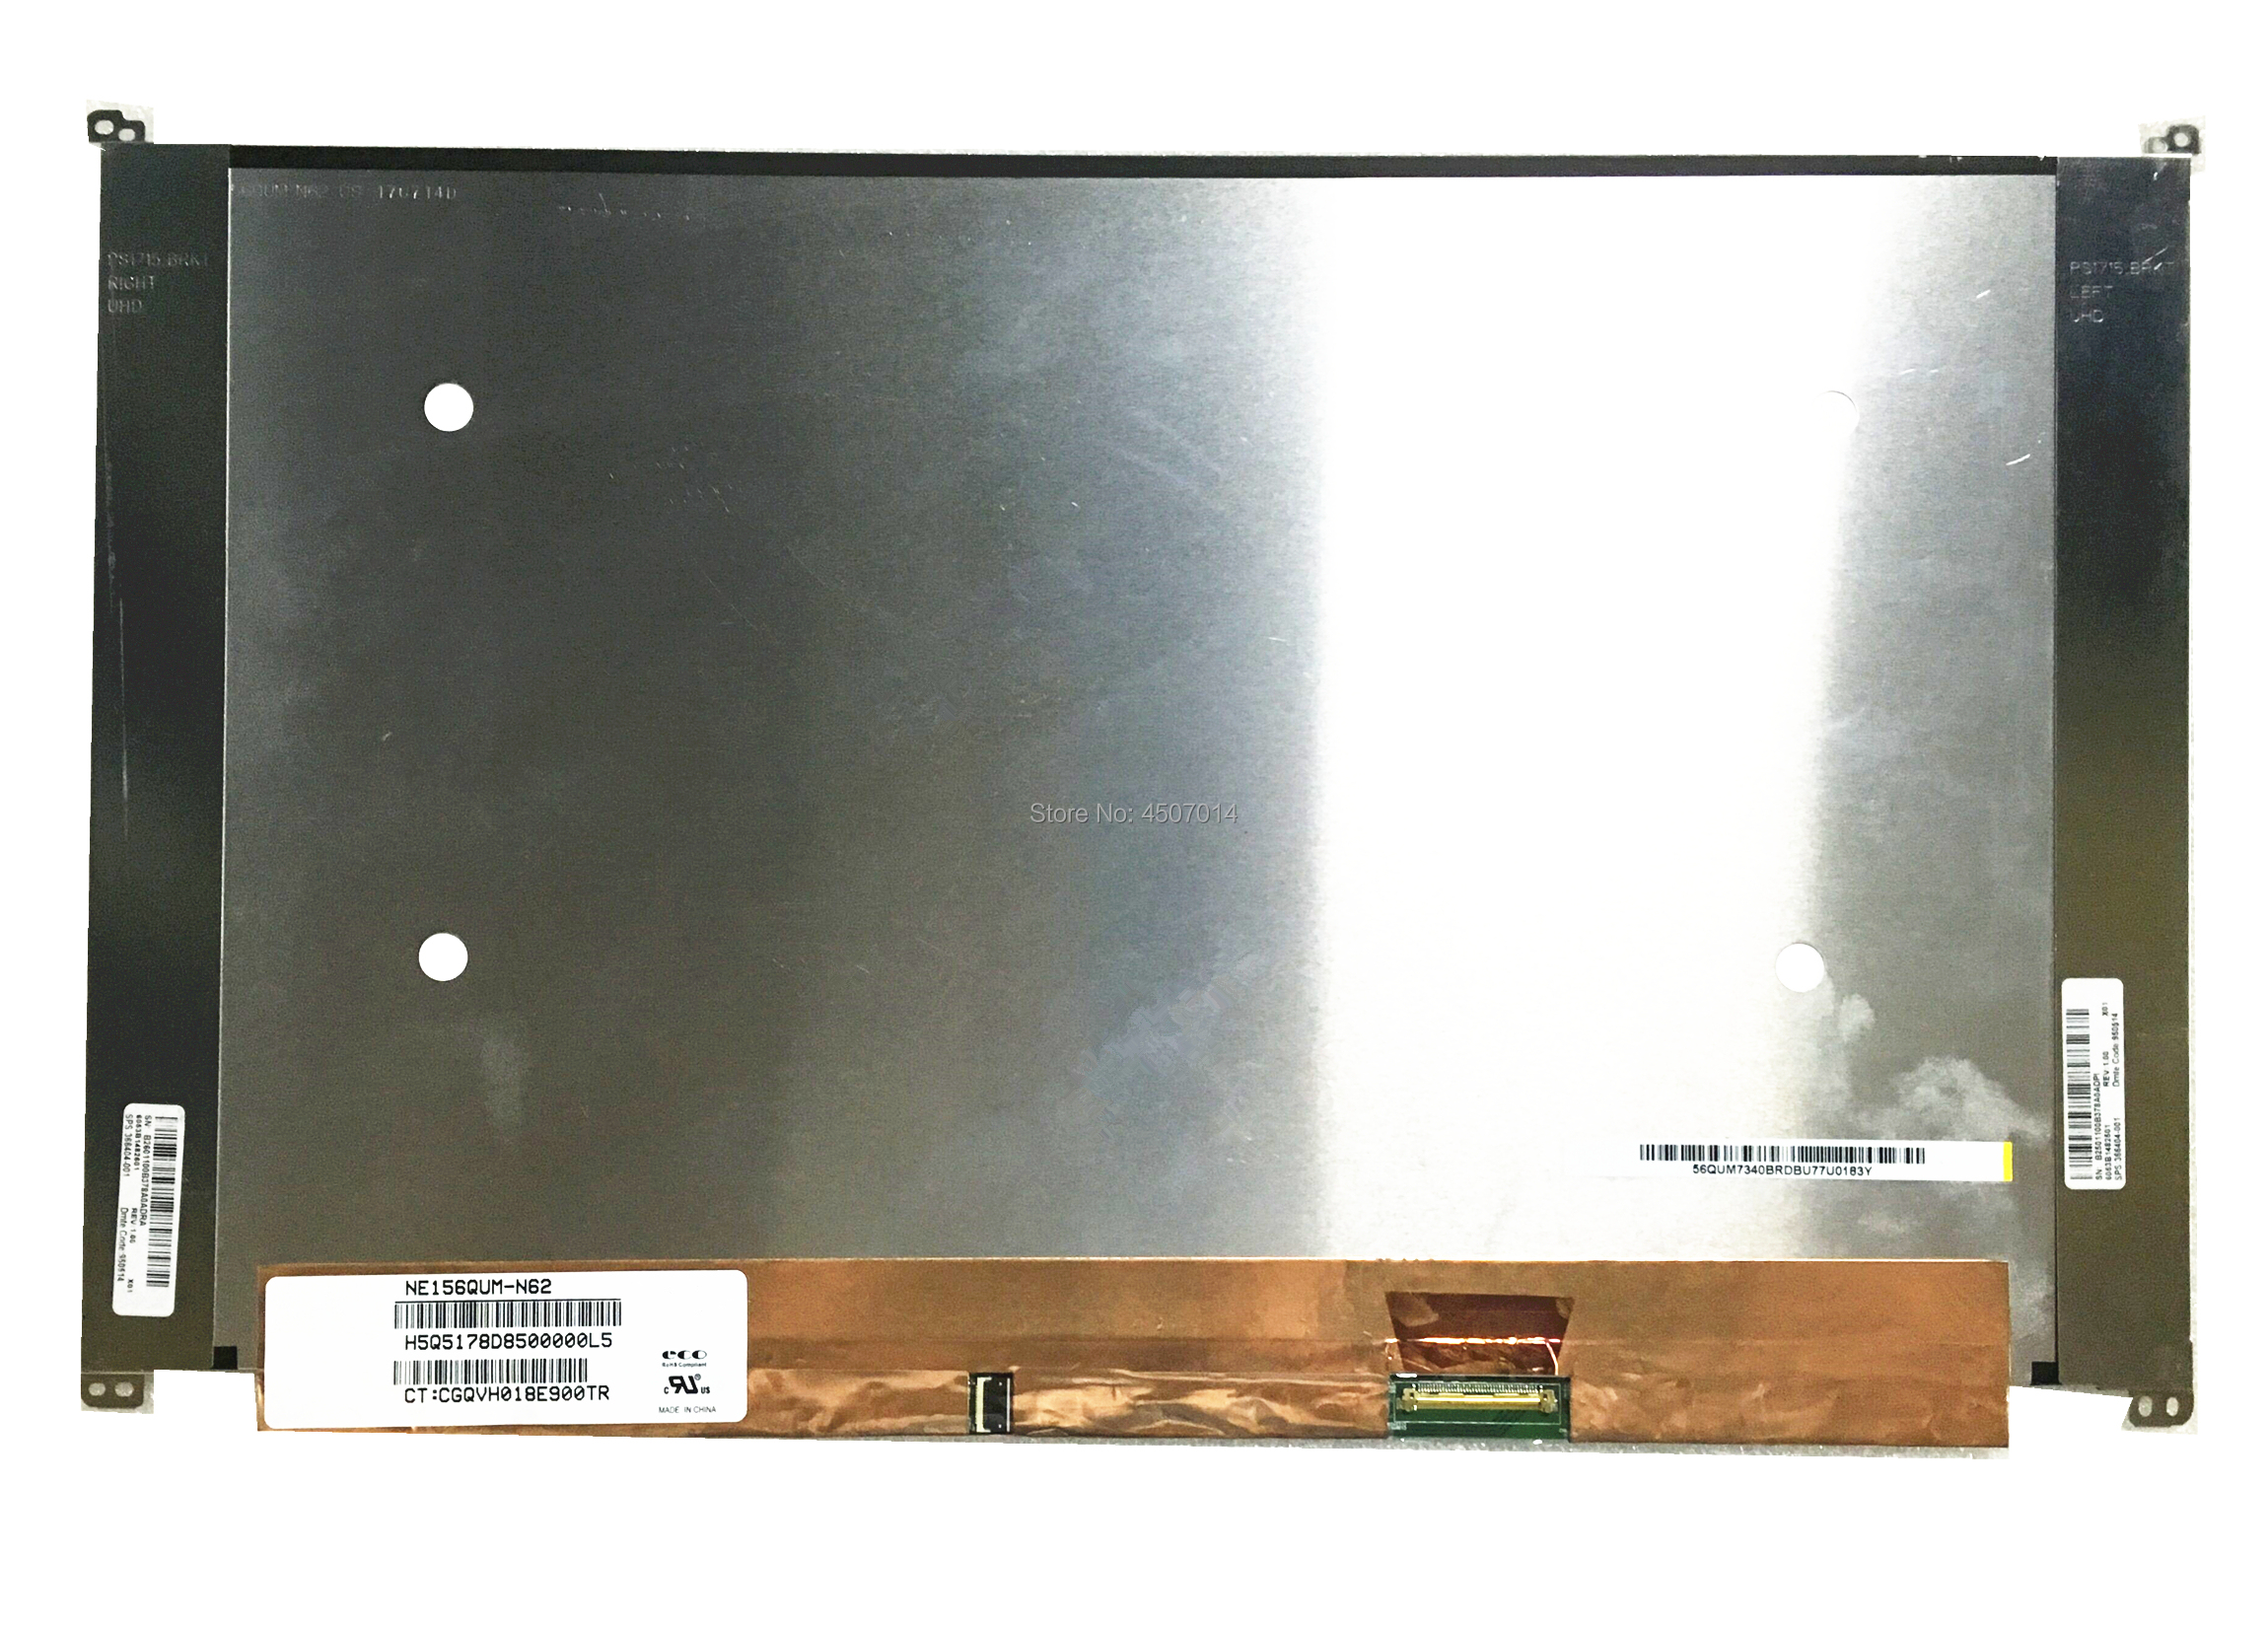 Free Shipping NE156QUM-N62 NE156QUM N62 15.6inch Laptop Lcd Screen Panel Free Shipping NE156QUM-N62 NE156QUM N62 15.6inch Laptop Lcd Screen Panel